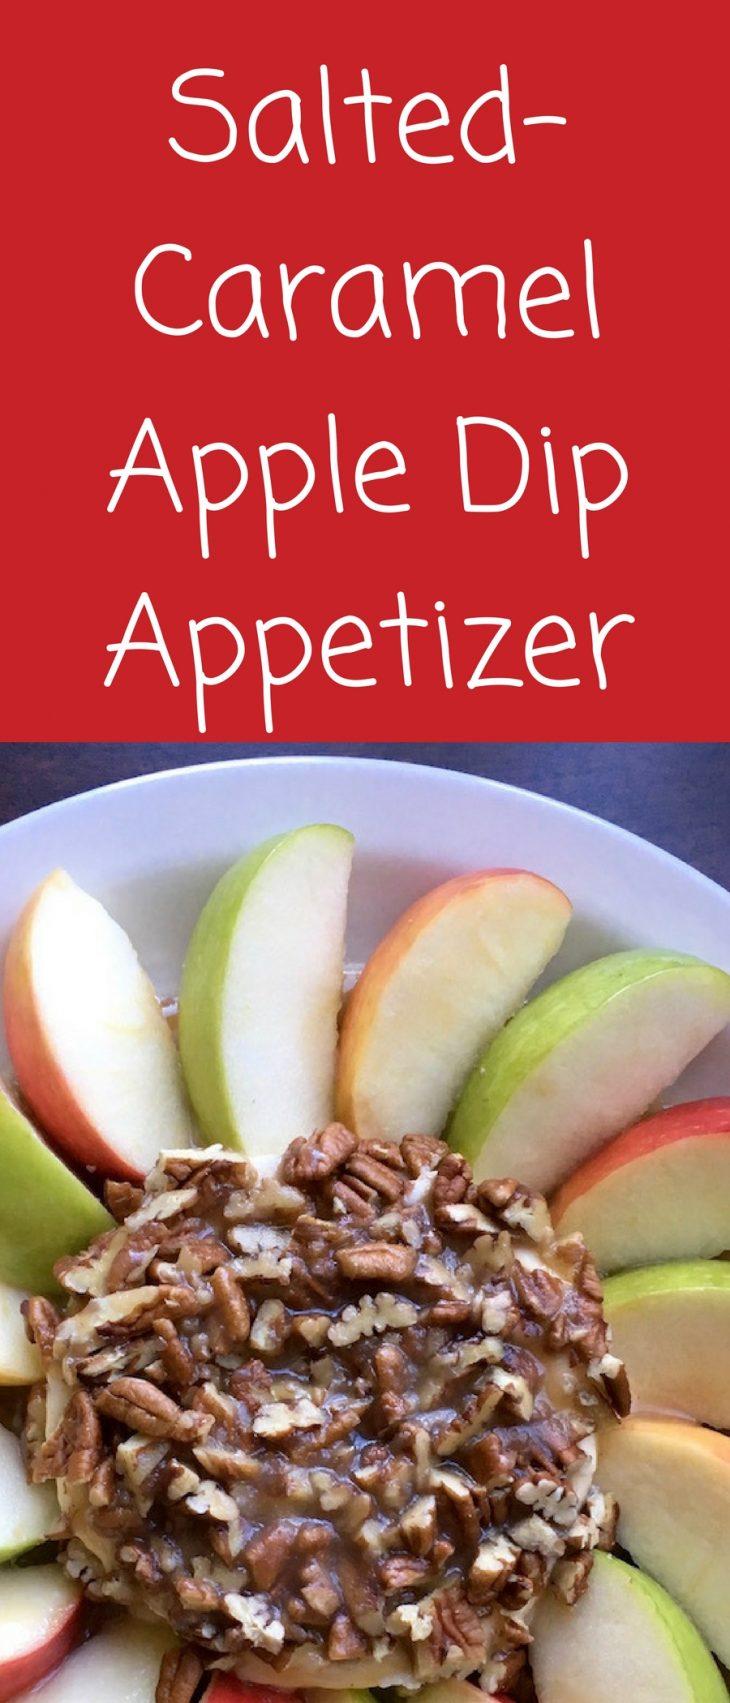 Salted-Caramel Apple Dip Appetizer